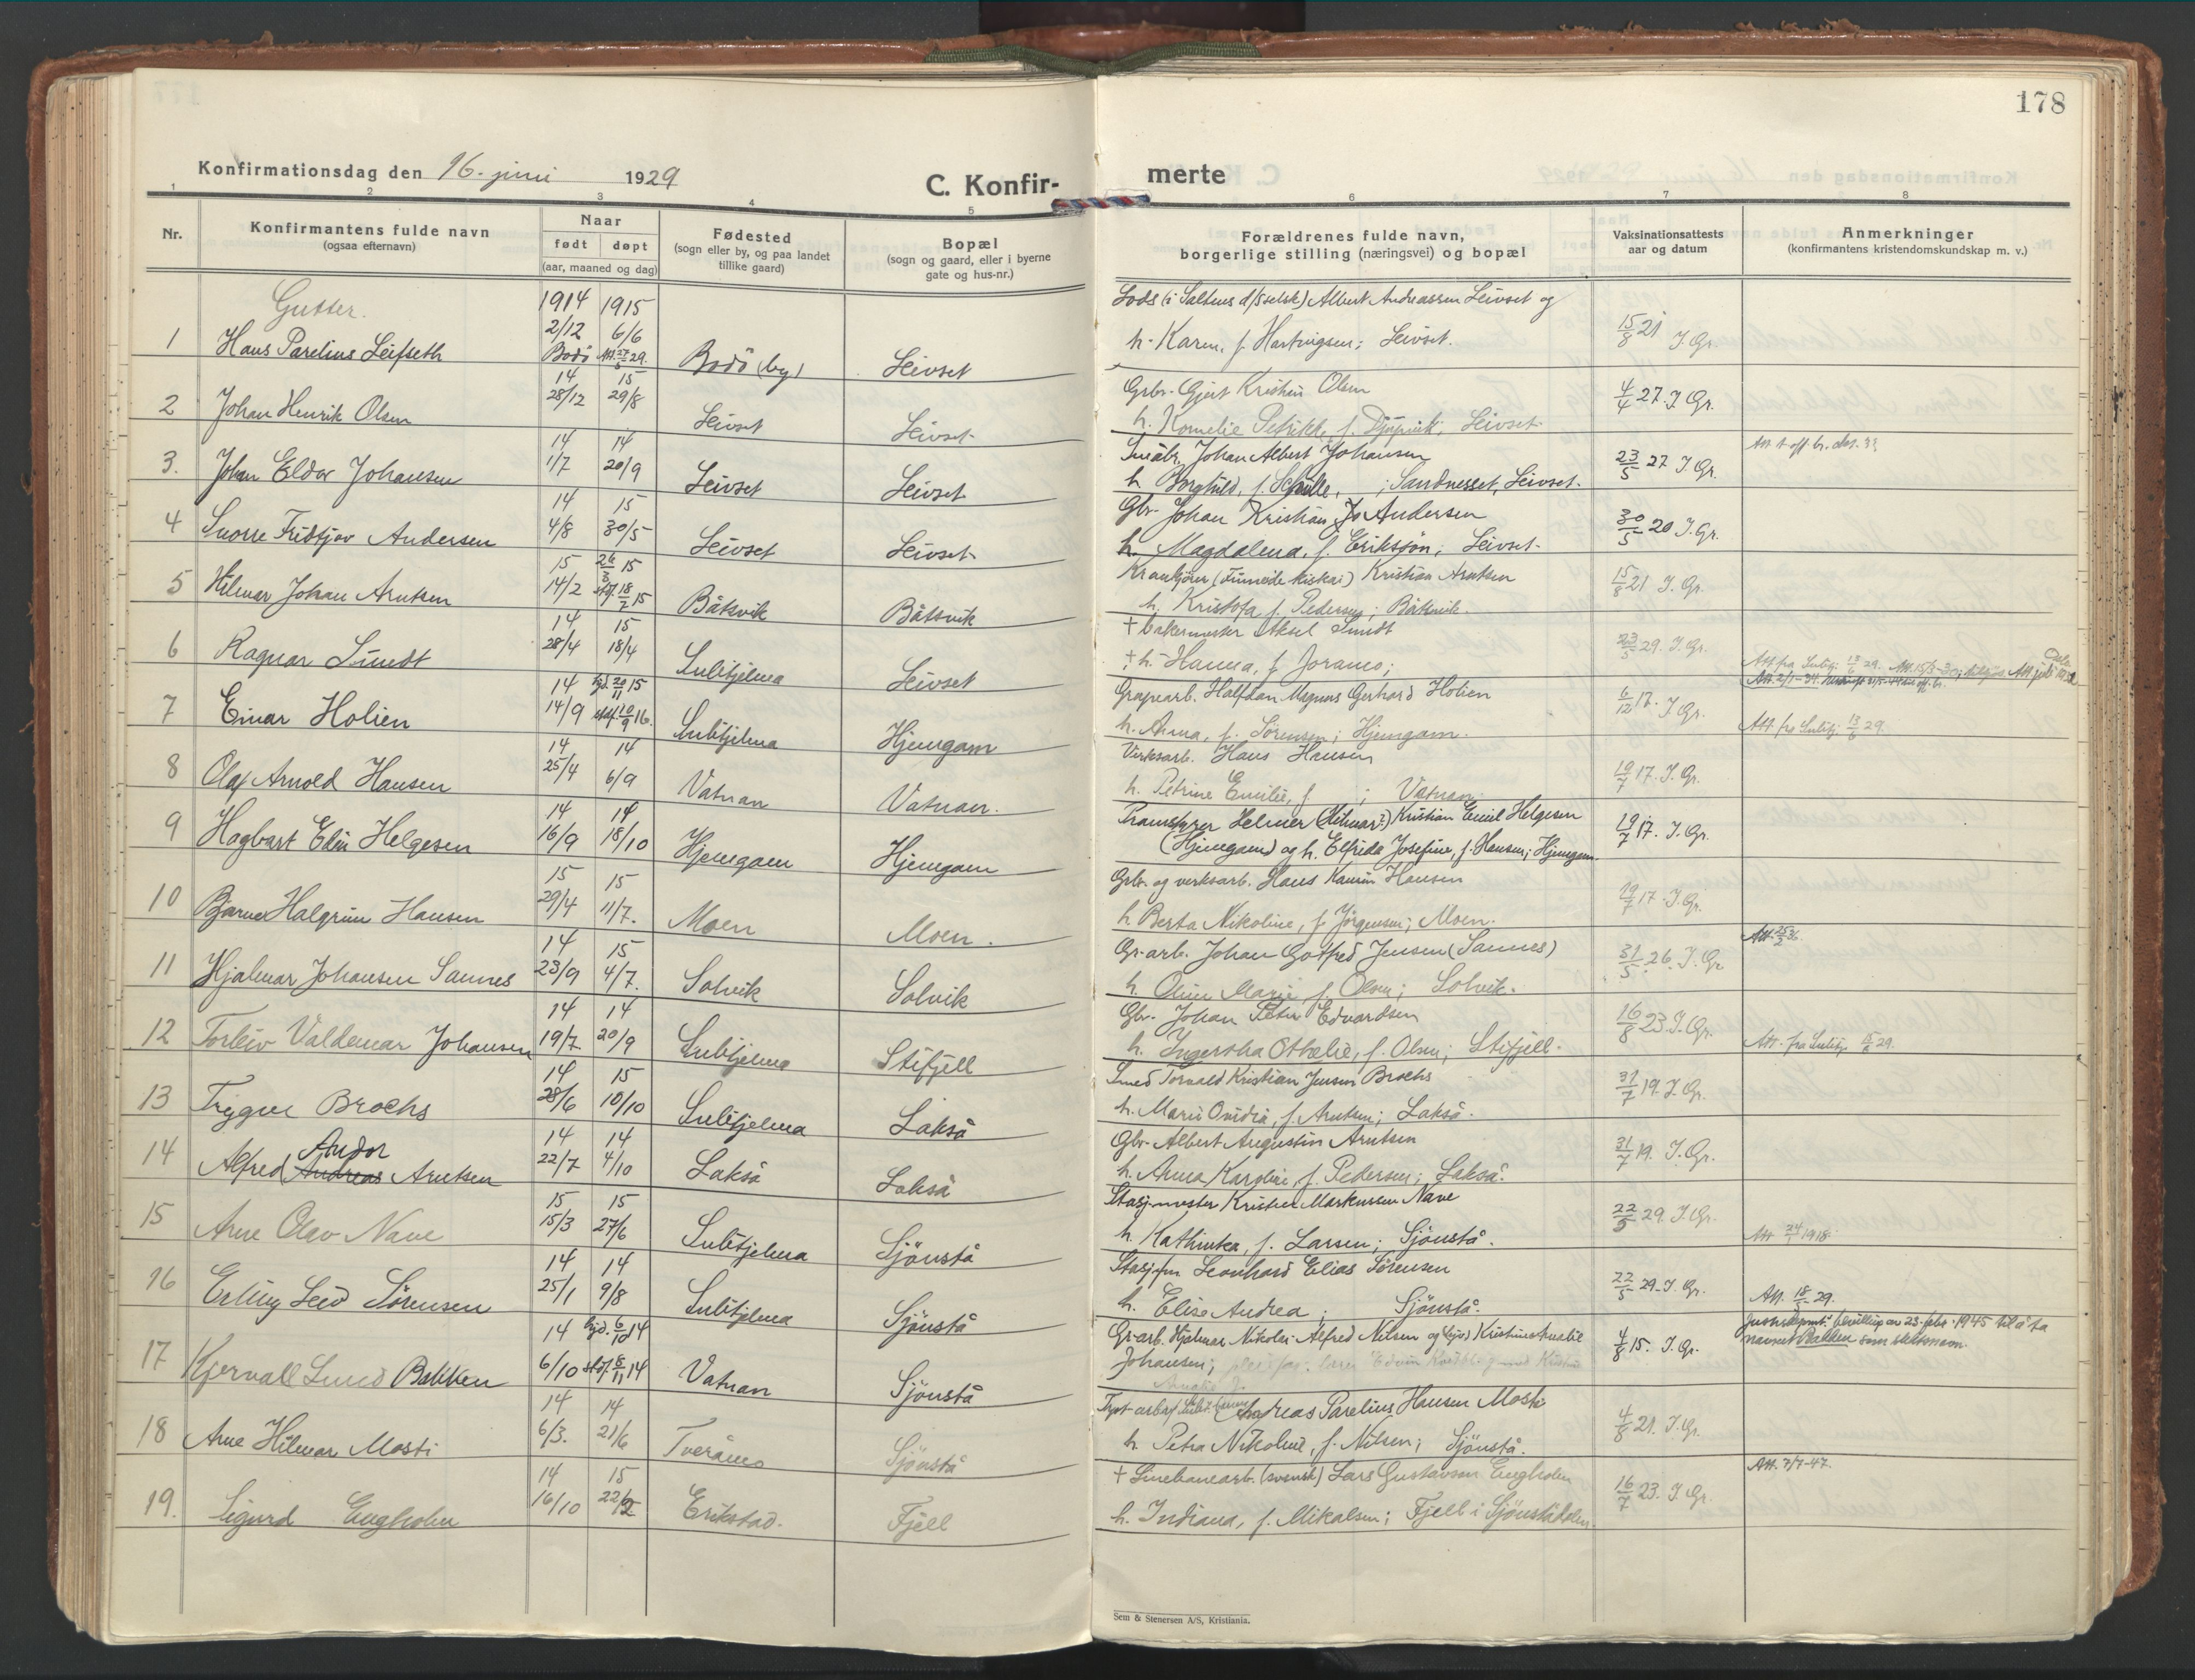 SAT, Ministerialprotokoller, klokkerbøker og fødselsregistre - Nordland, 849/L0699: Ministerialbok nr. 849A10, 1924-1937, s. 178